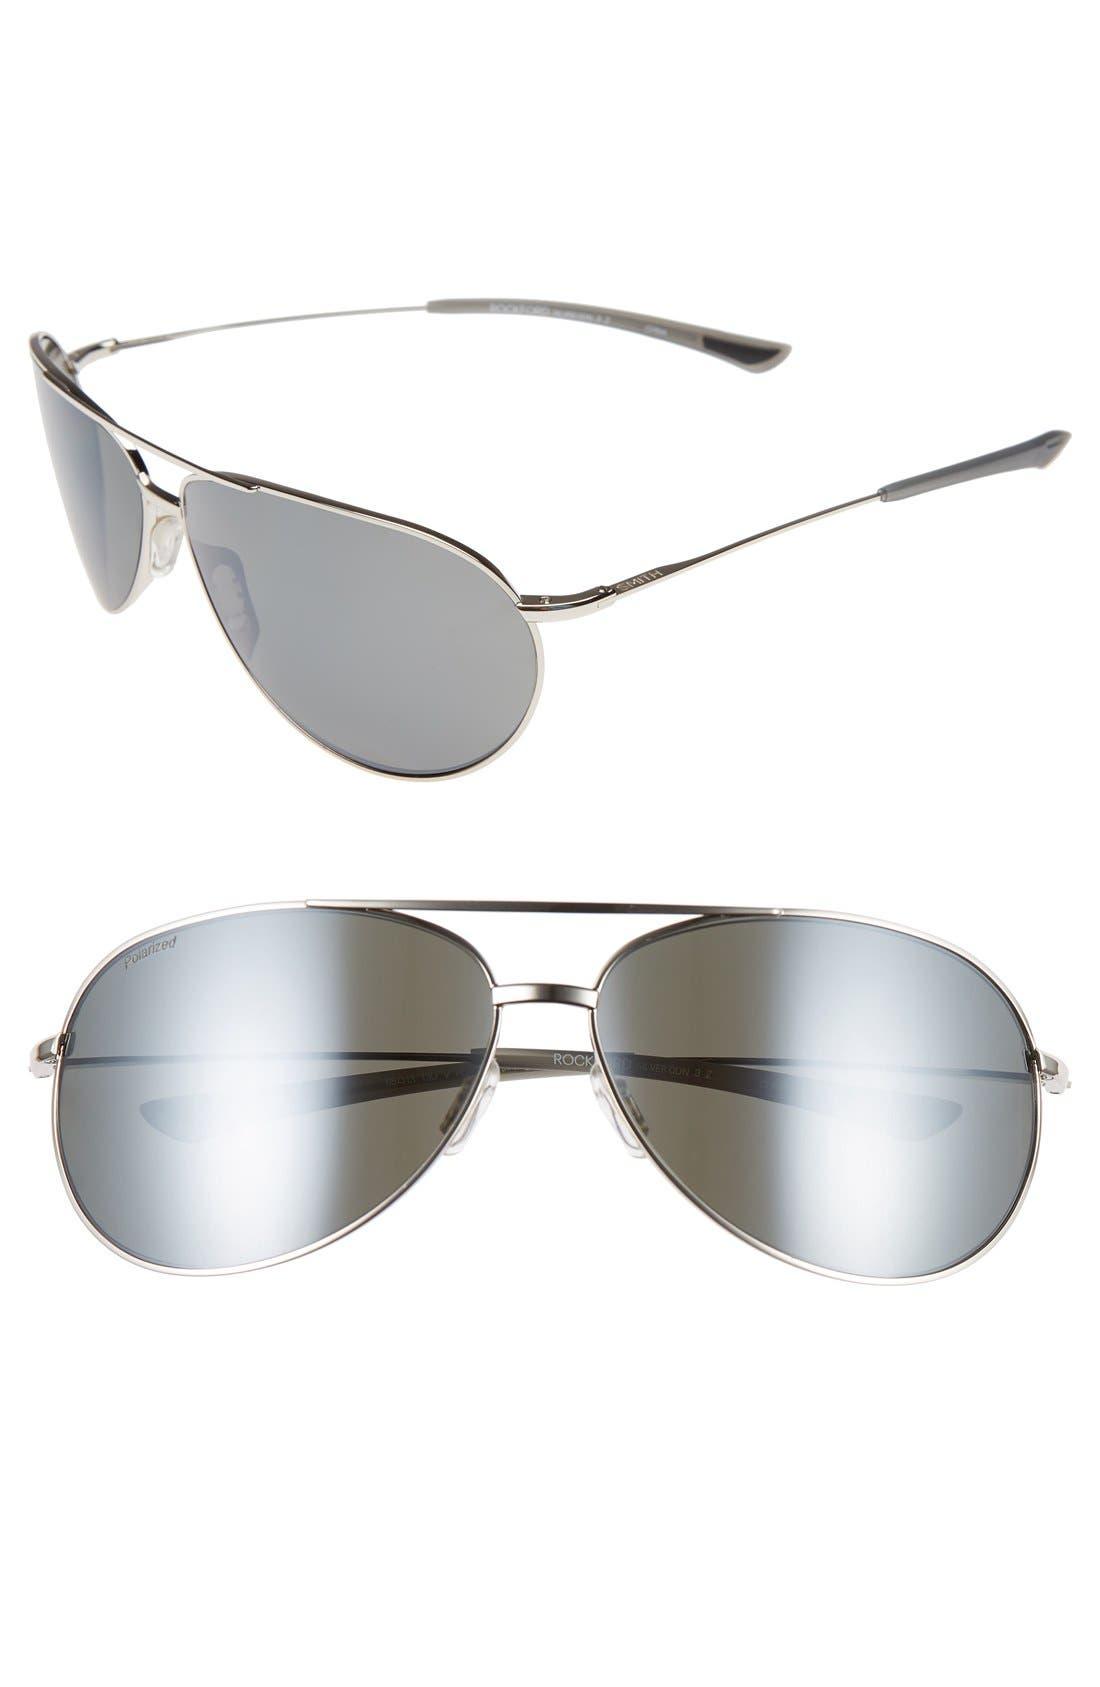 'Rockford' 65mm Polarized Aviator Sunglasses,                             Main thumbnail 1, color,                             040